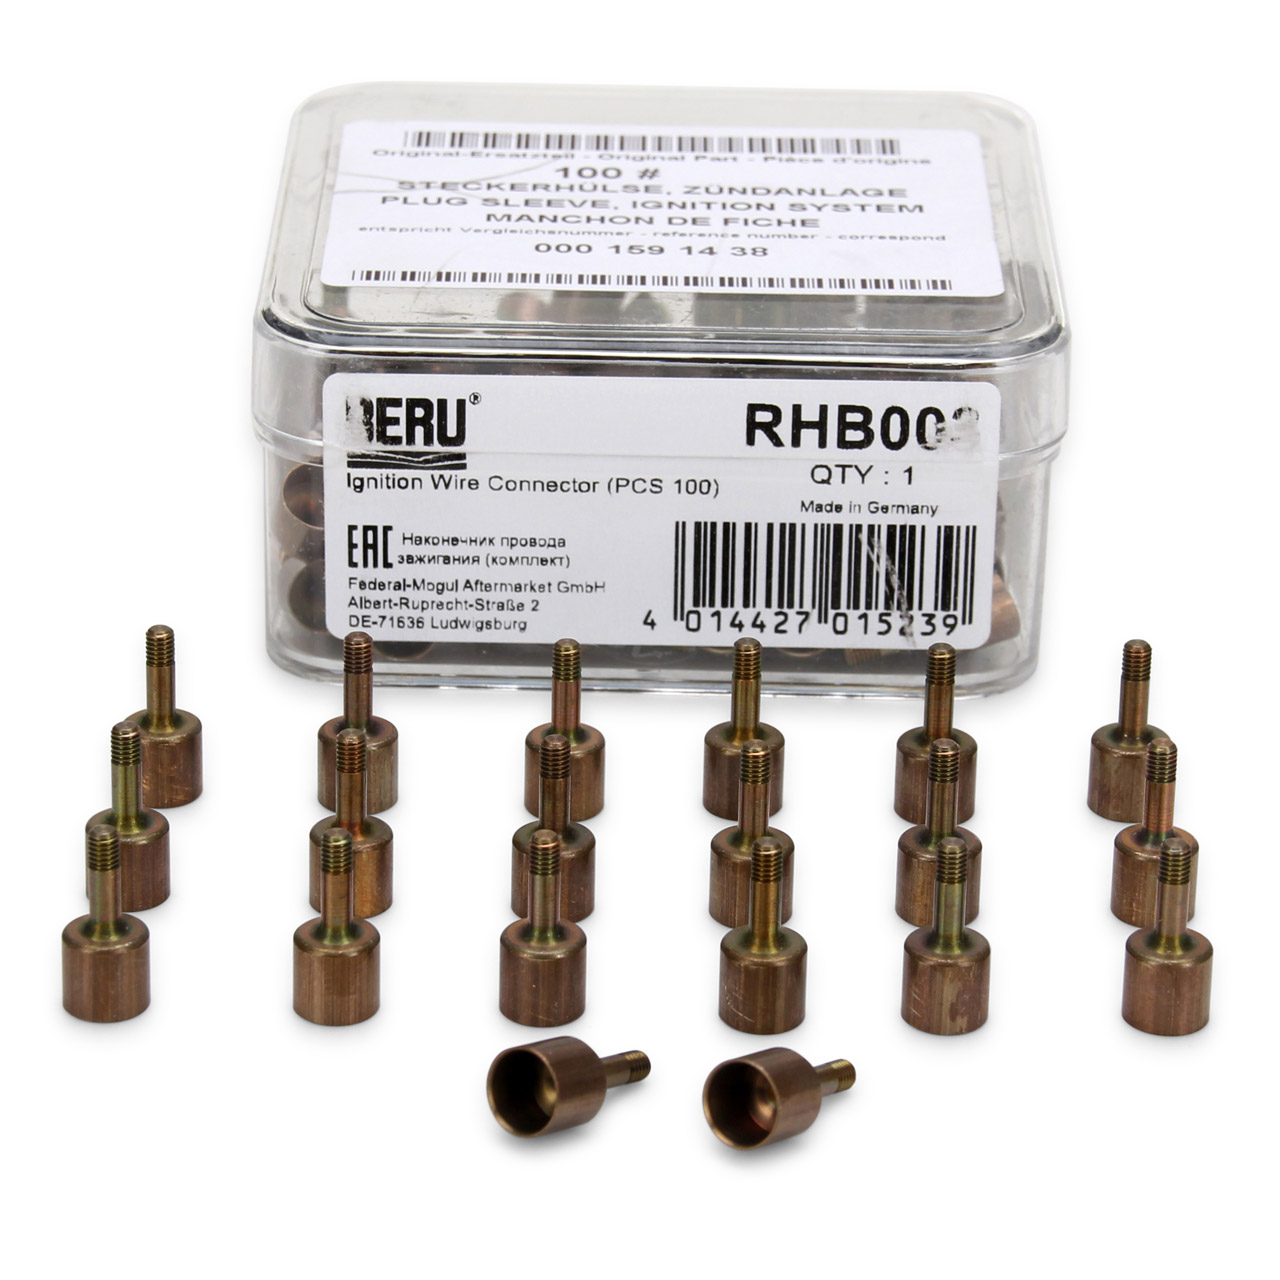 20x BERU RHB003 Steckerhülse Zündkabel MERCEDES W201 W202 W210 W126 W140 R129